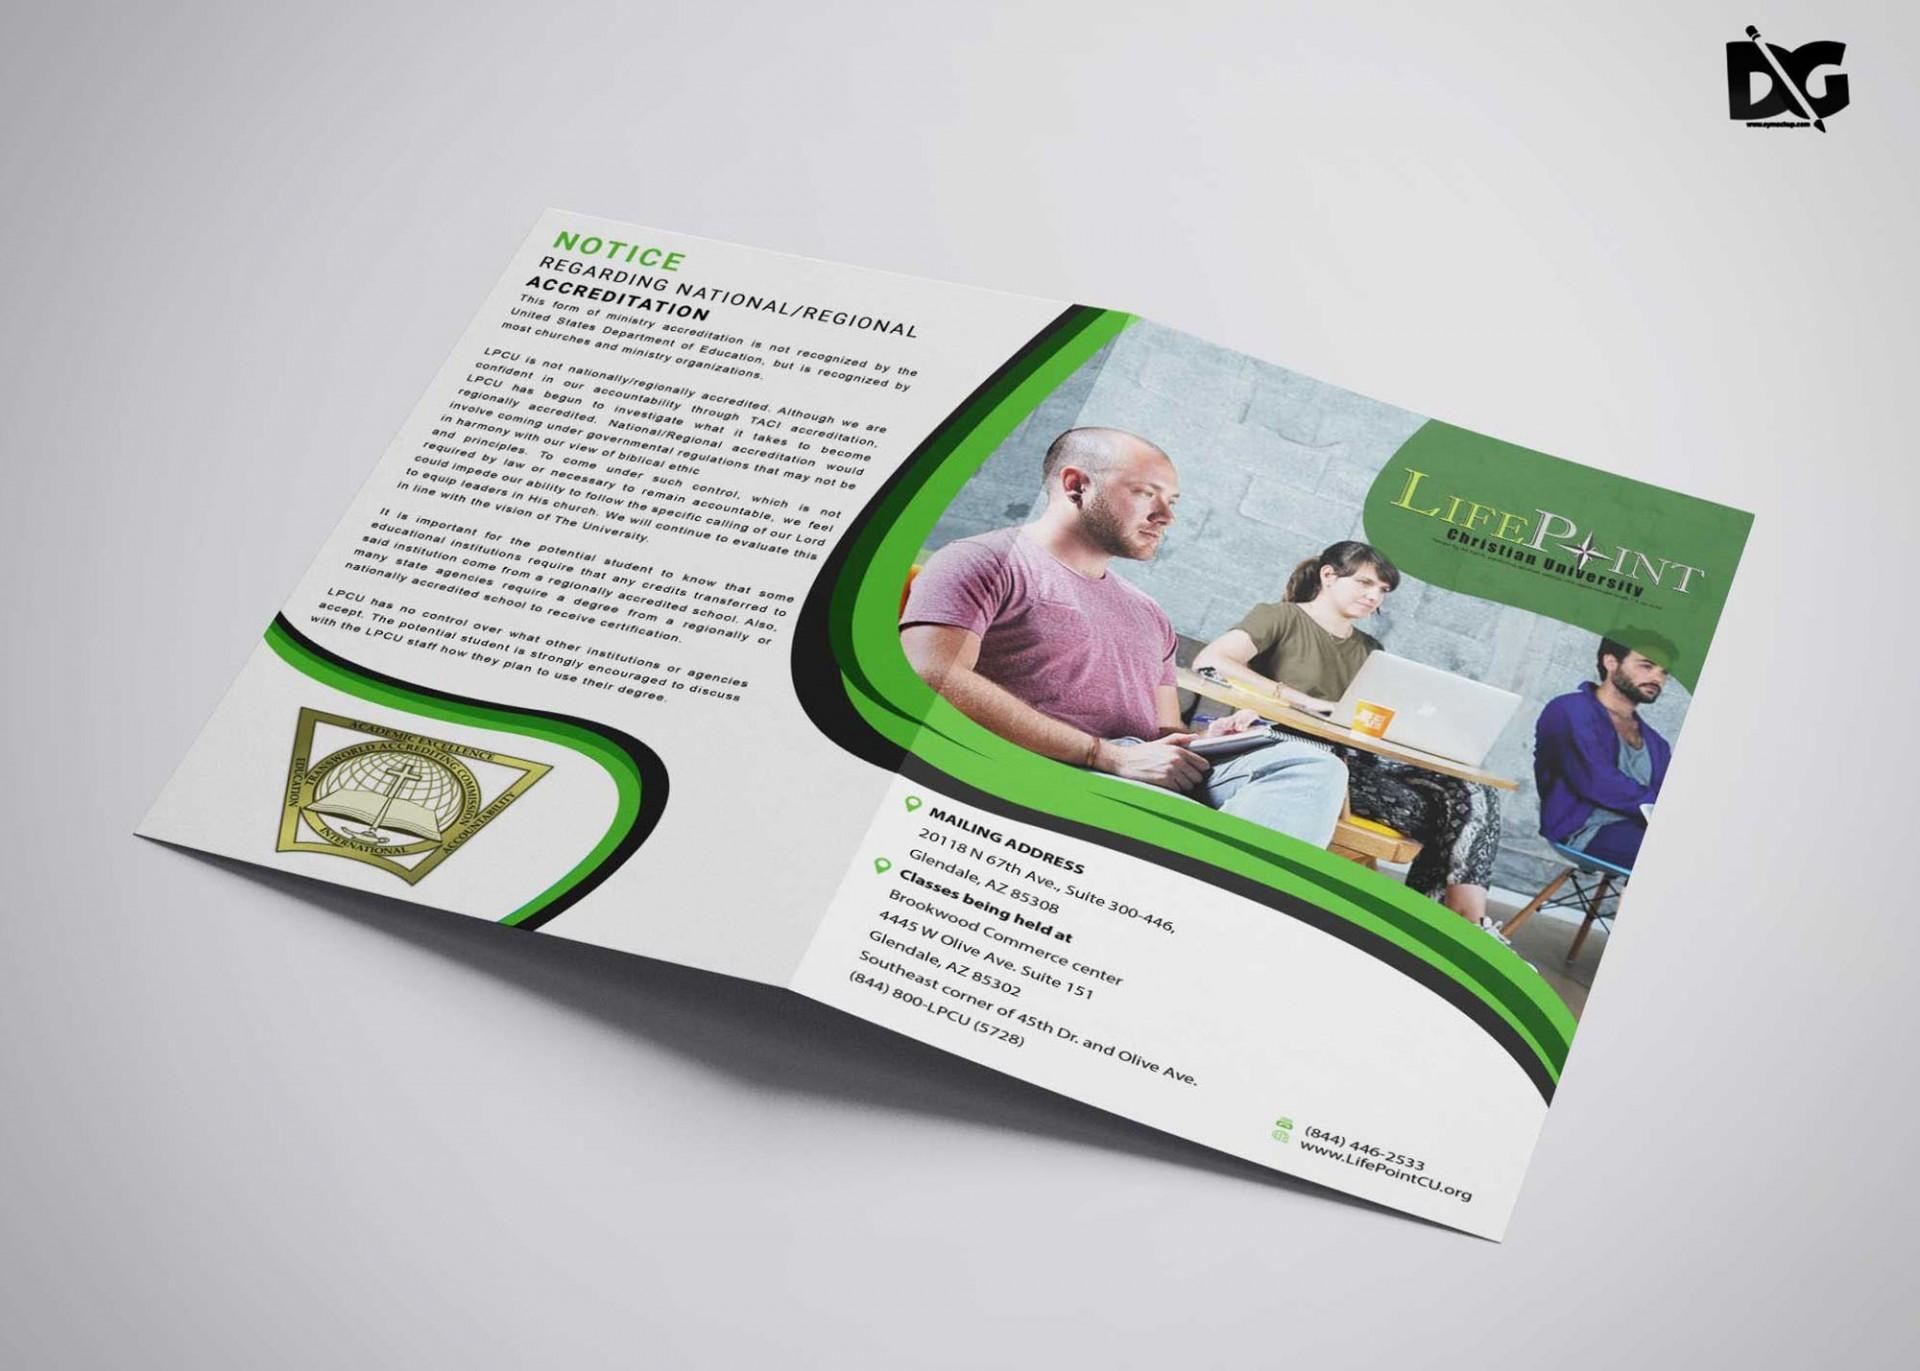 006 Impressive Brochure Design Template Free Download Psd Highest Quality 1920